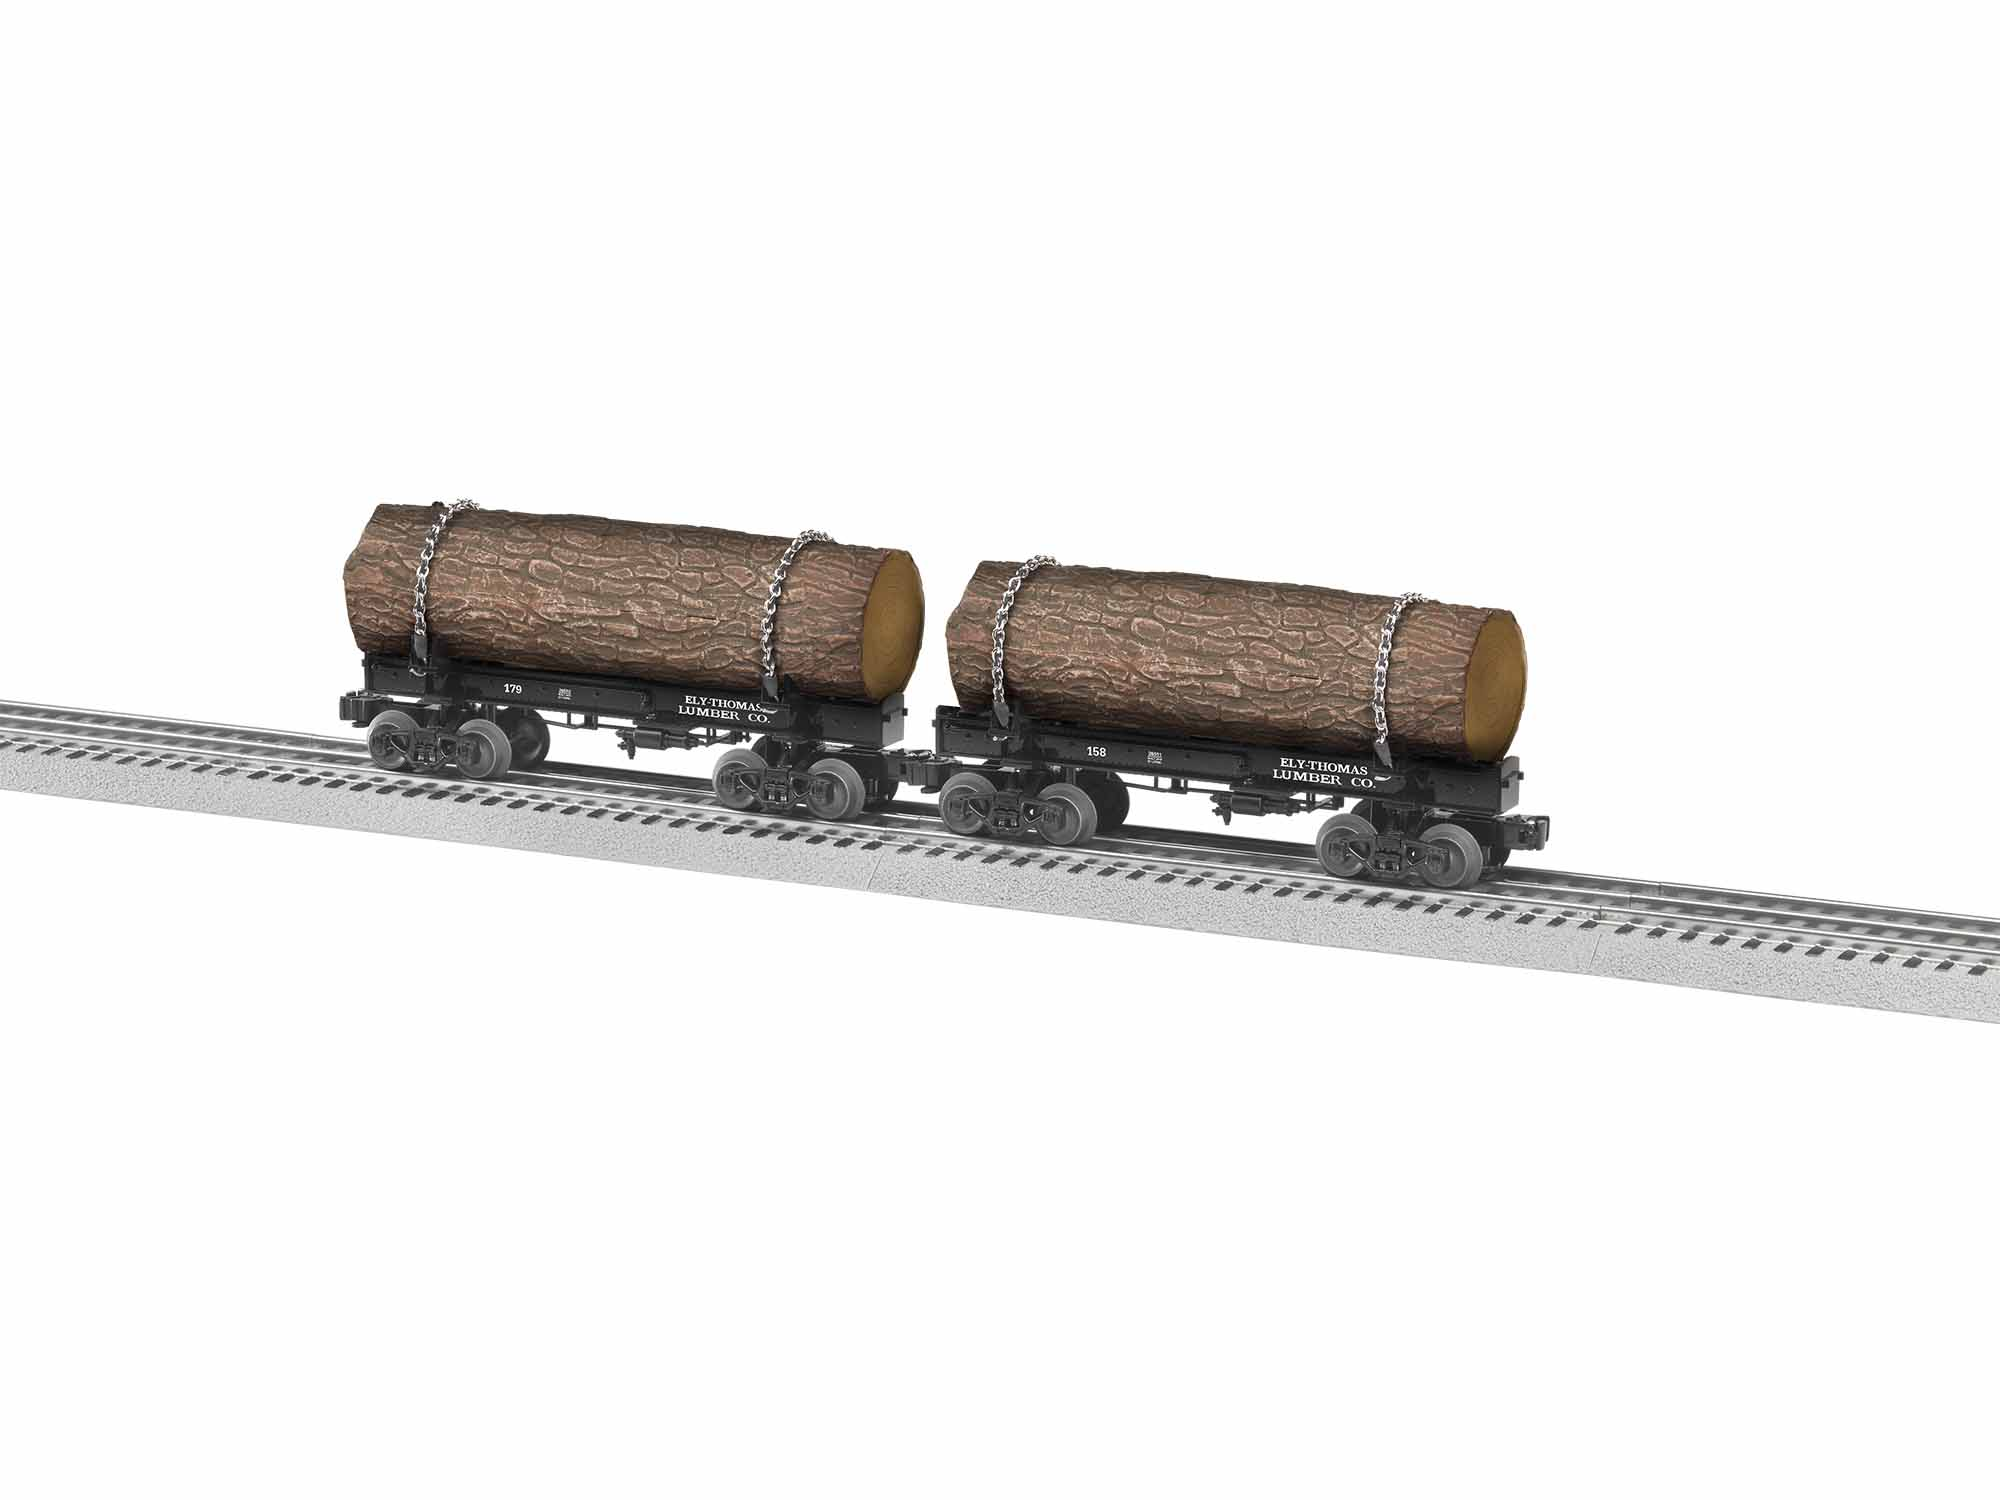 LNL1926550 Lionel O Skeleton Log Car, Ely Thomas (2) Pack B